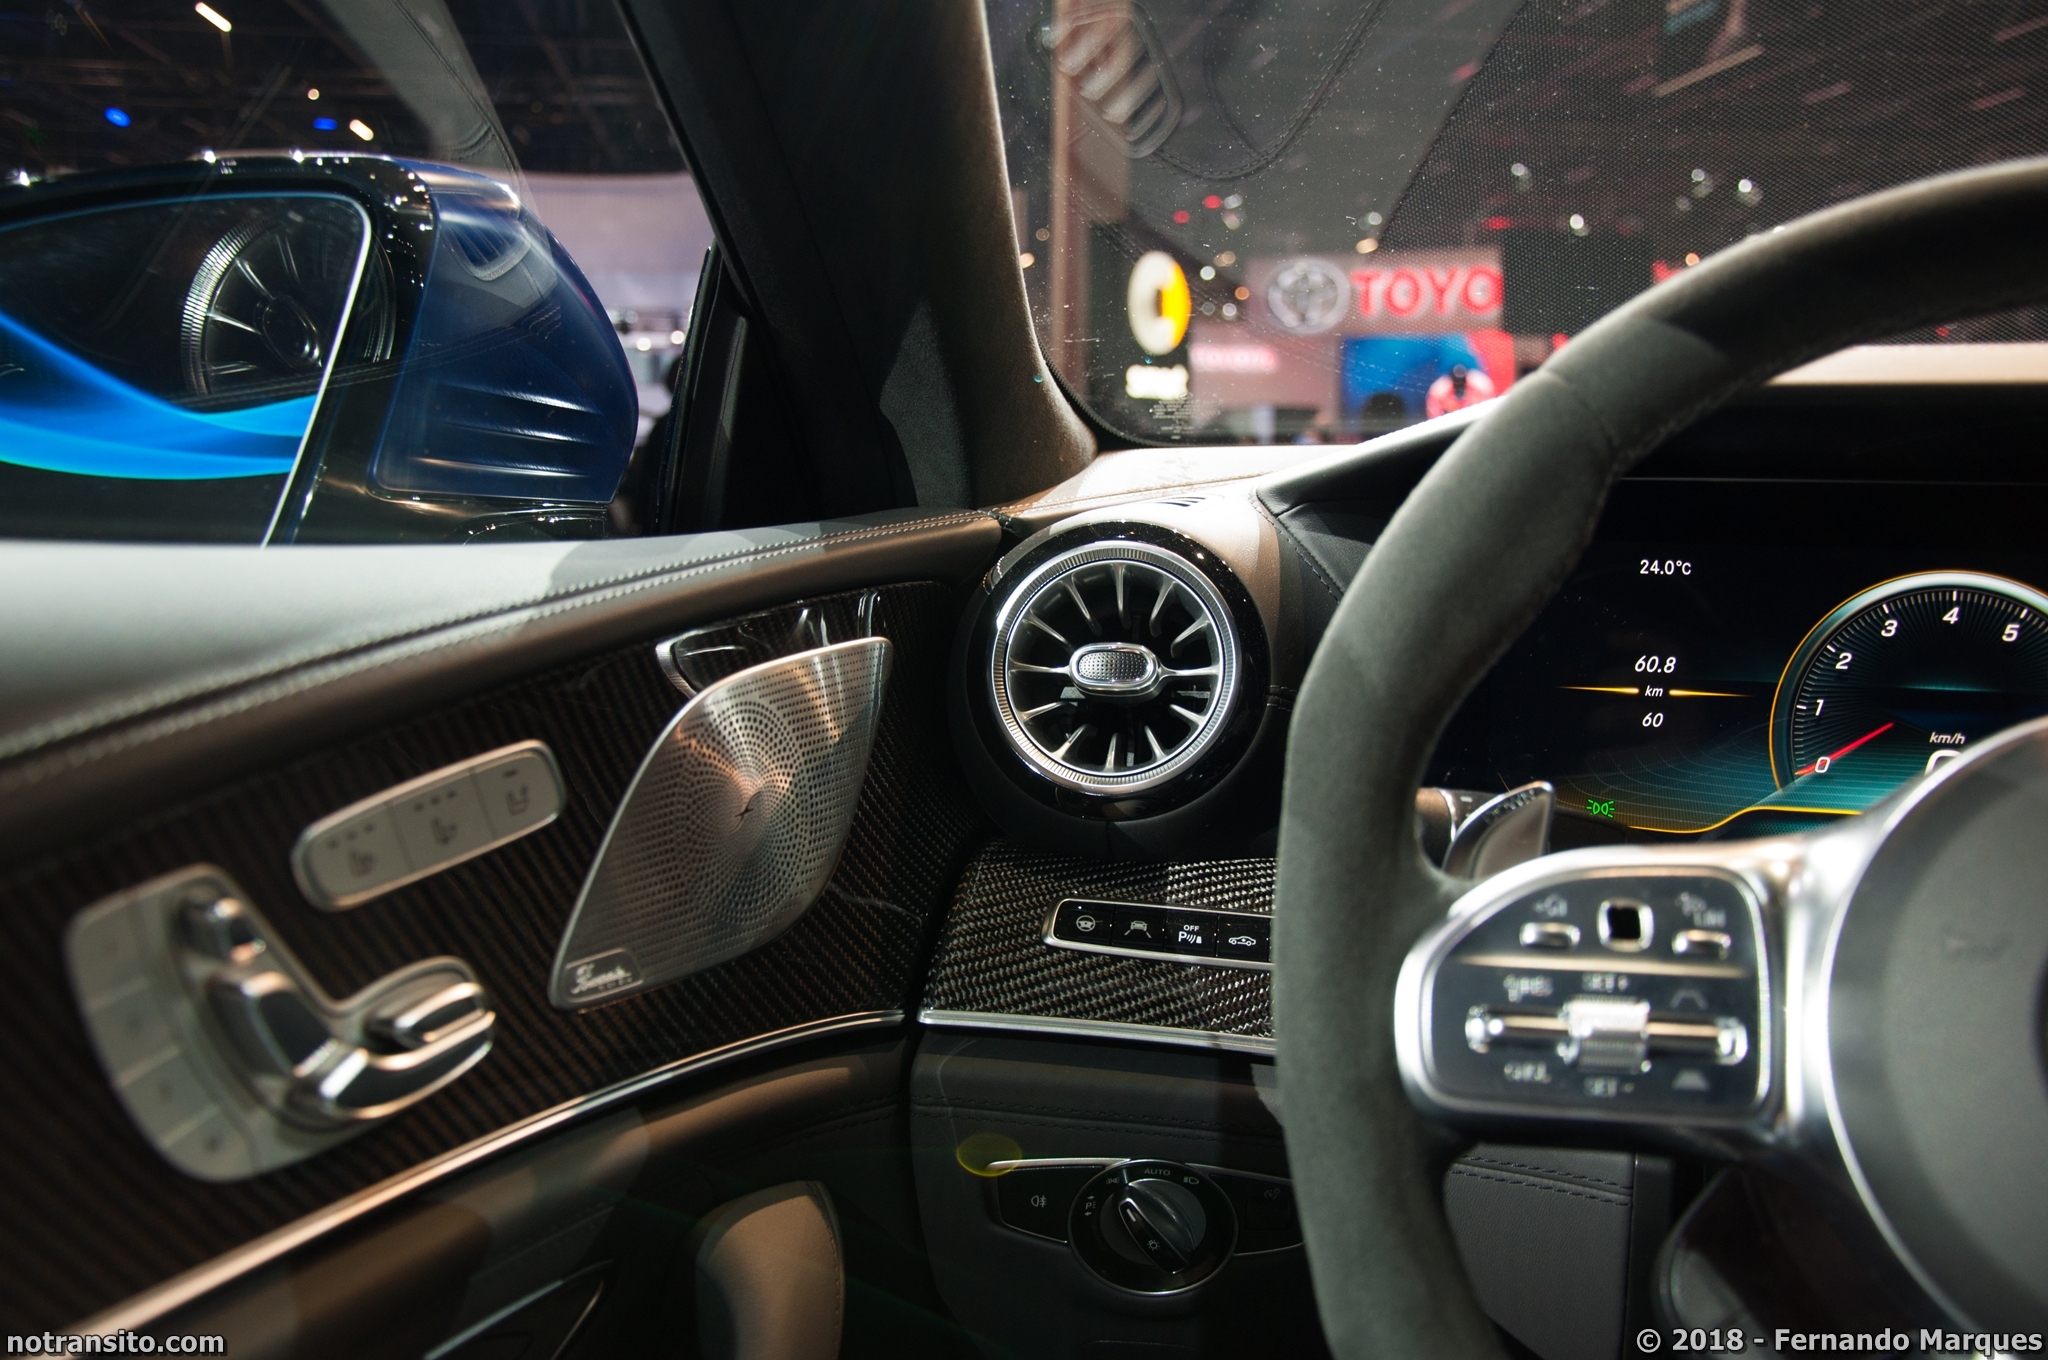 Salão2018-ConheçaoEstandedaMercedes-Benz- Parte1-030